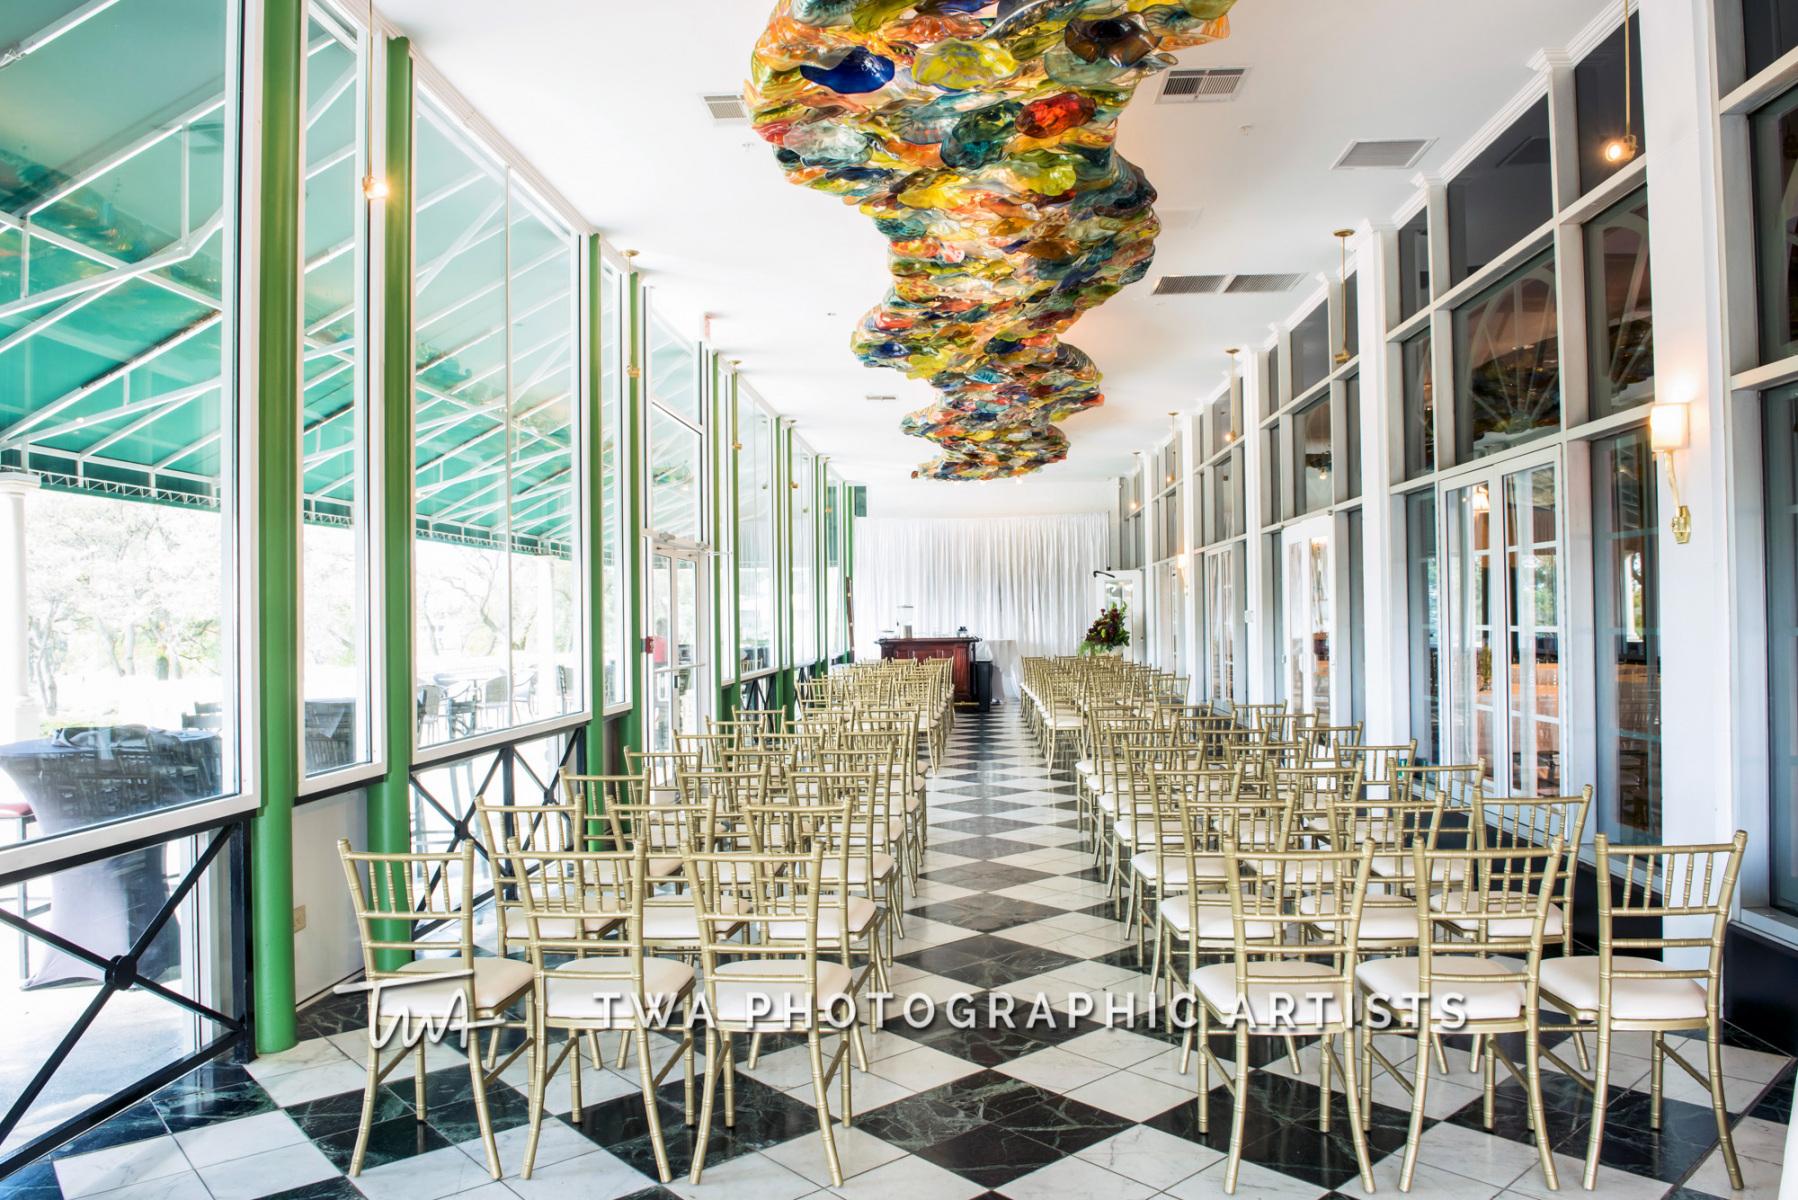 Chicago-Wedding-Photographer-TWA-Photographic-Artists-Drake-Oak-Brook_Razfar_Friedman_JH-0007